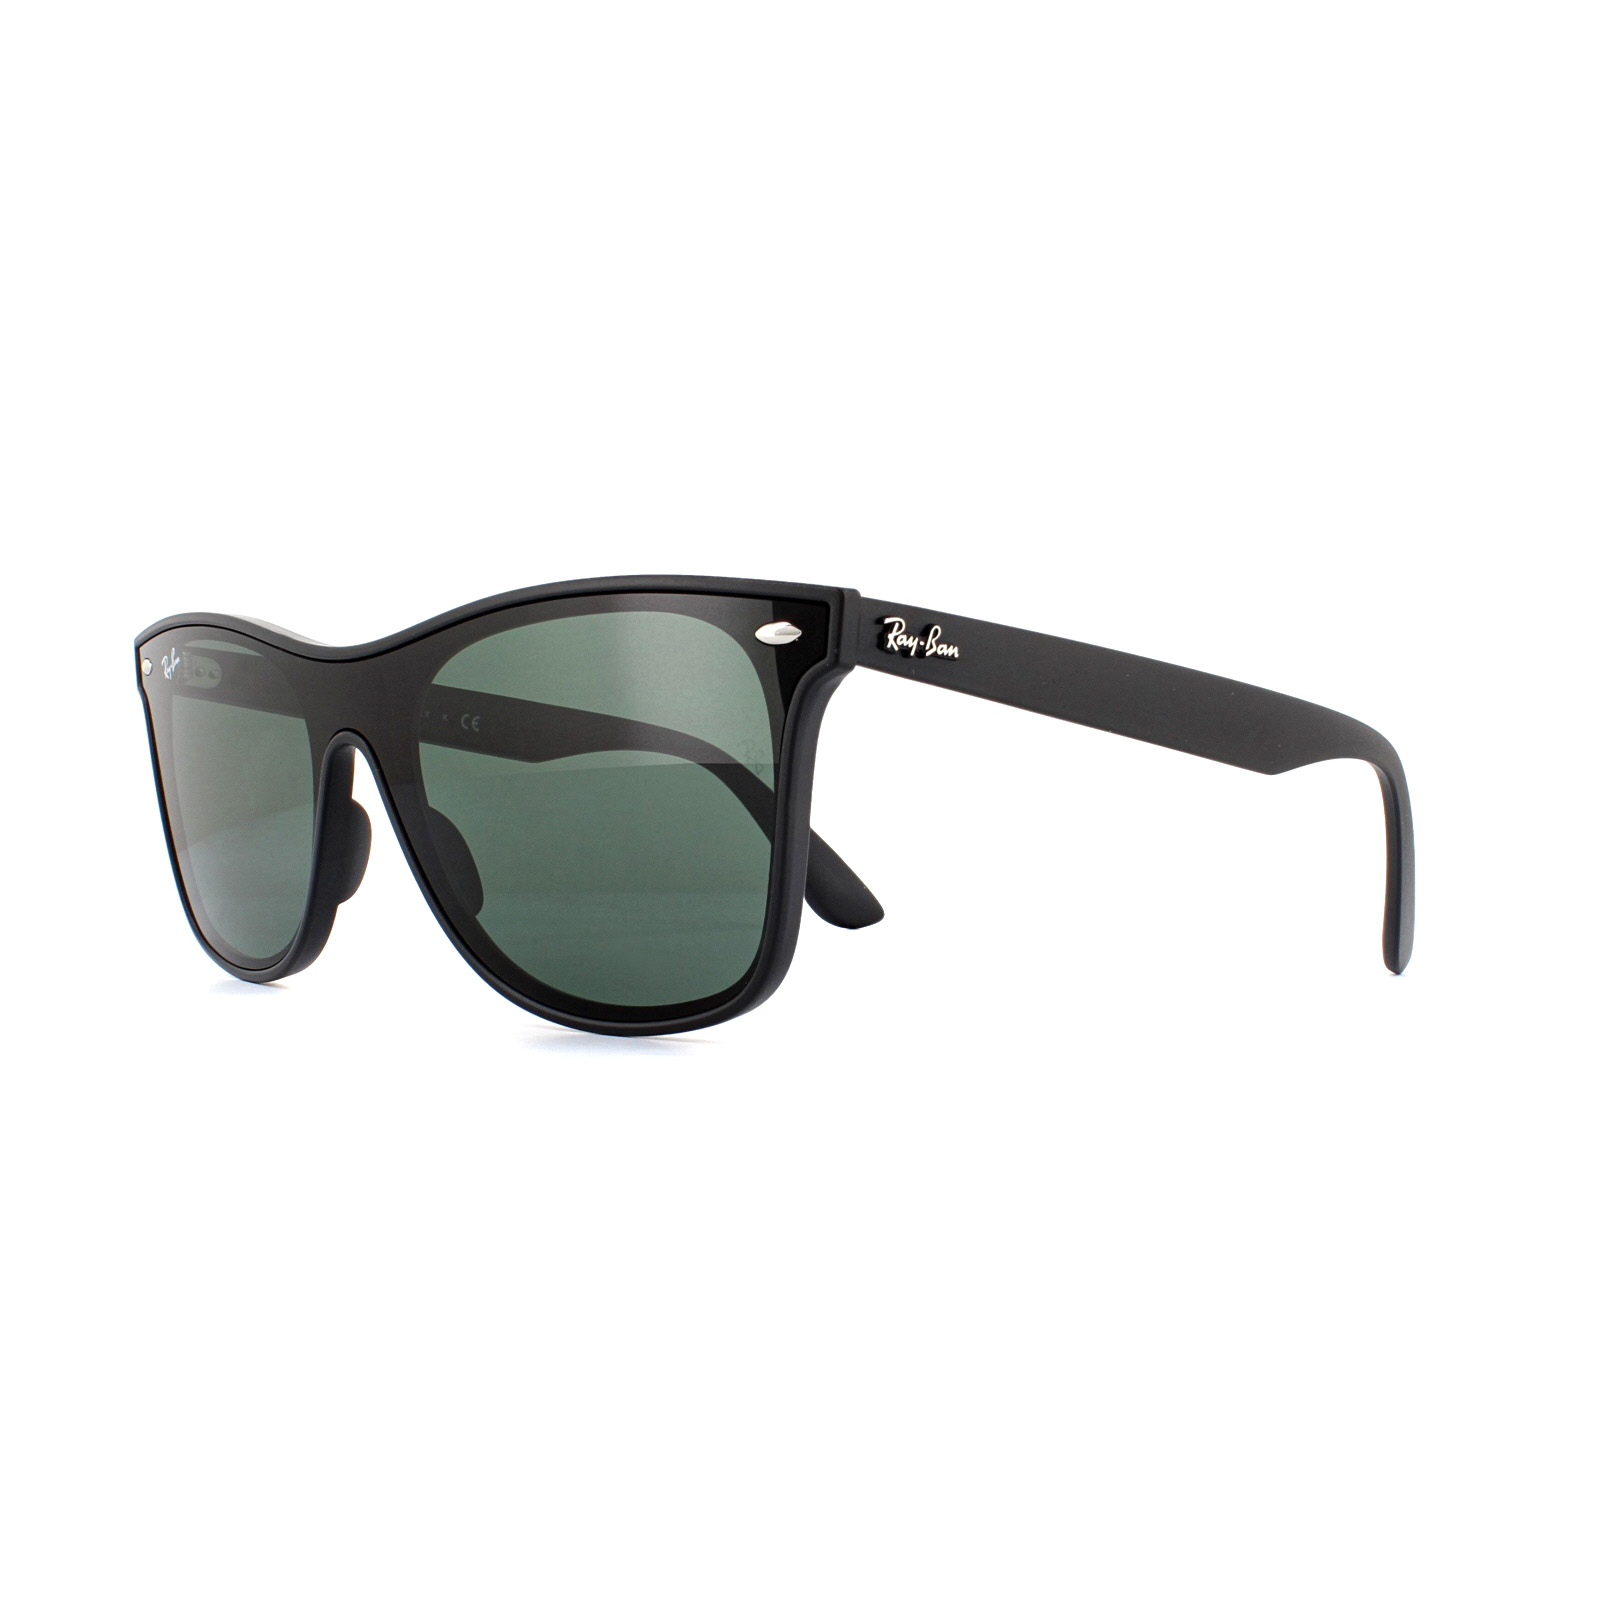 c394fcc7f02 Cheap Ray-Ban Blaze Wayfarer 4440N Sunglasses - Discounted Sunglasses